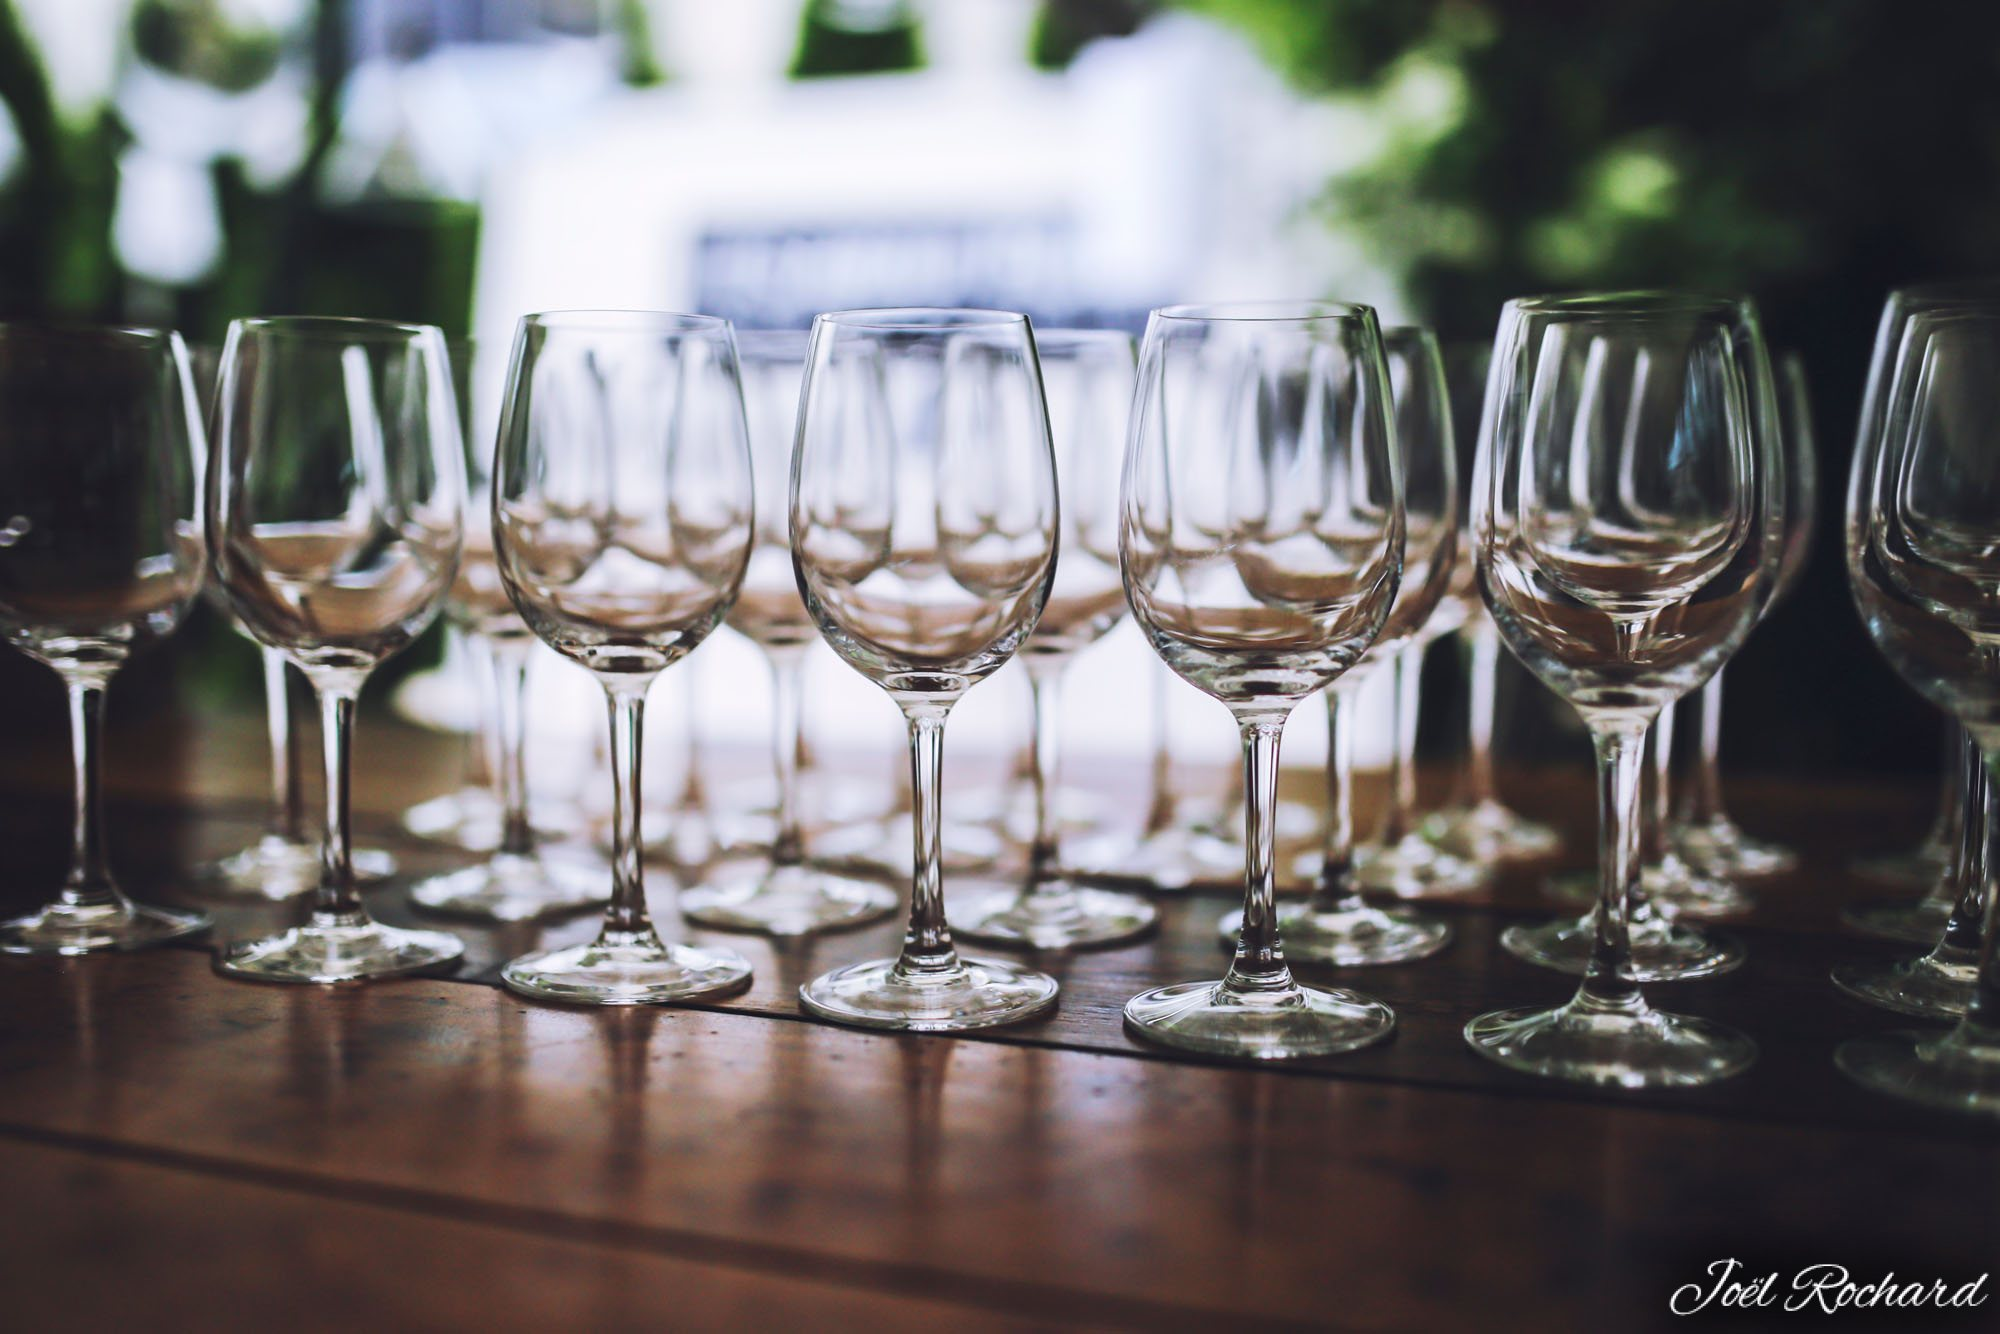 Winery 2019